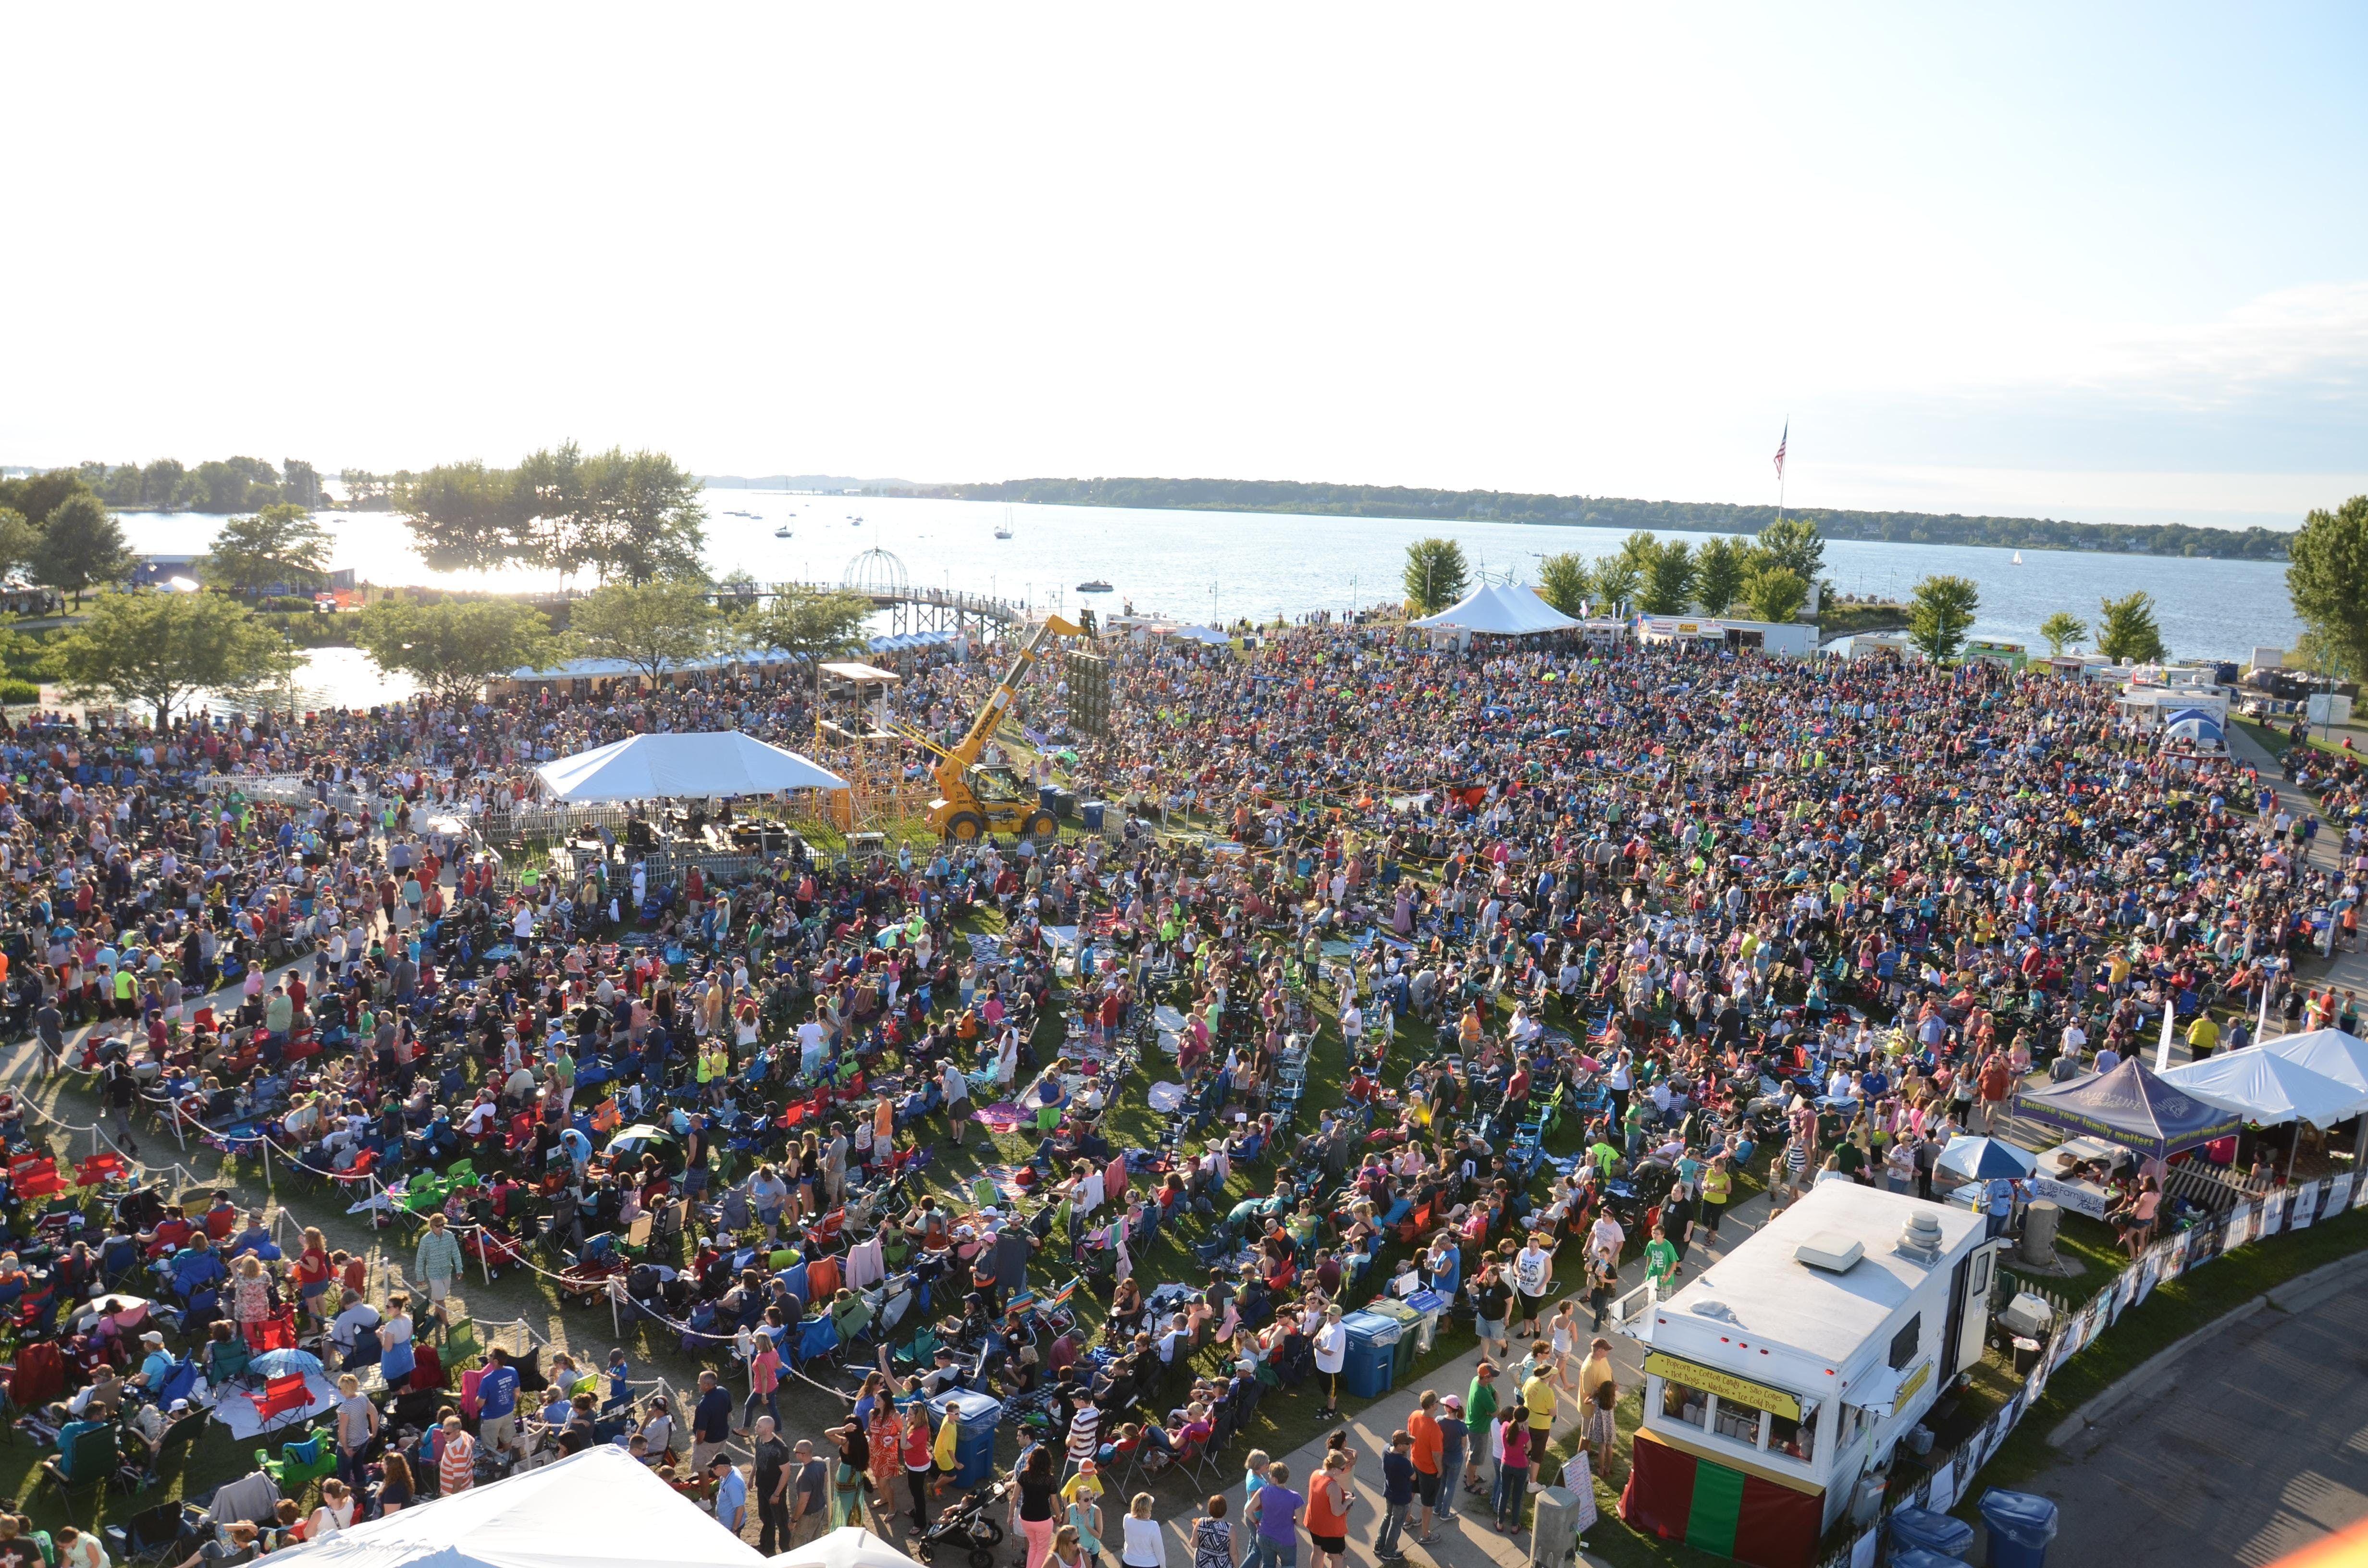 Unity Christian Music Festival - 2019